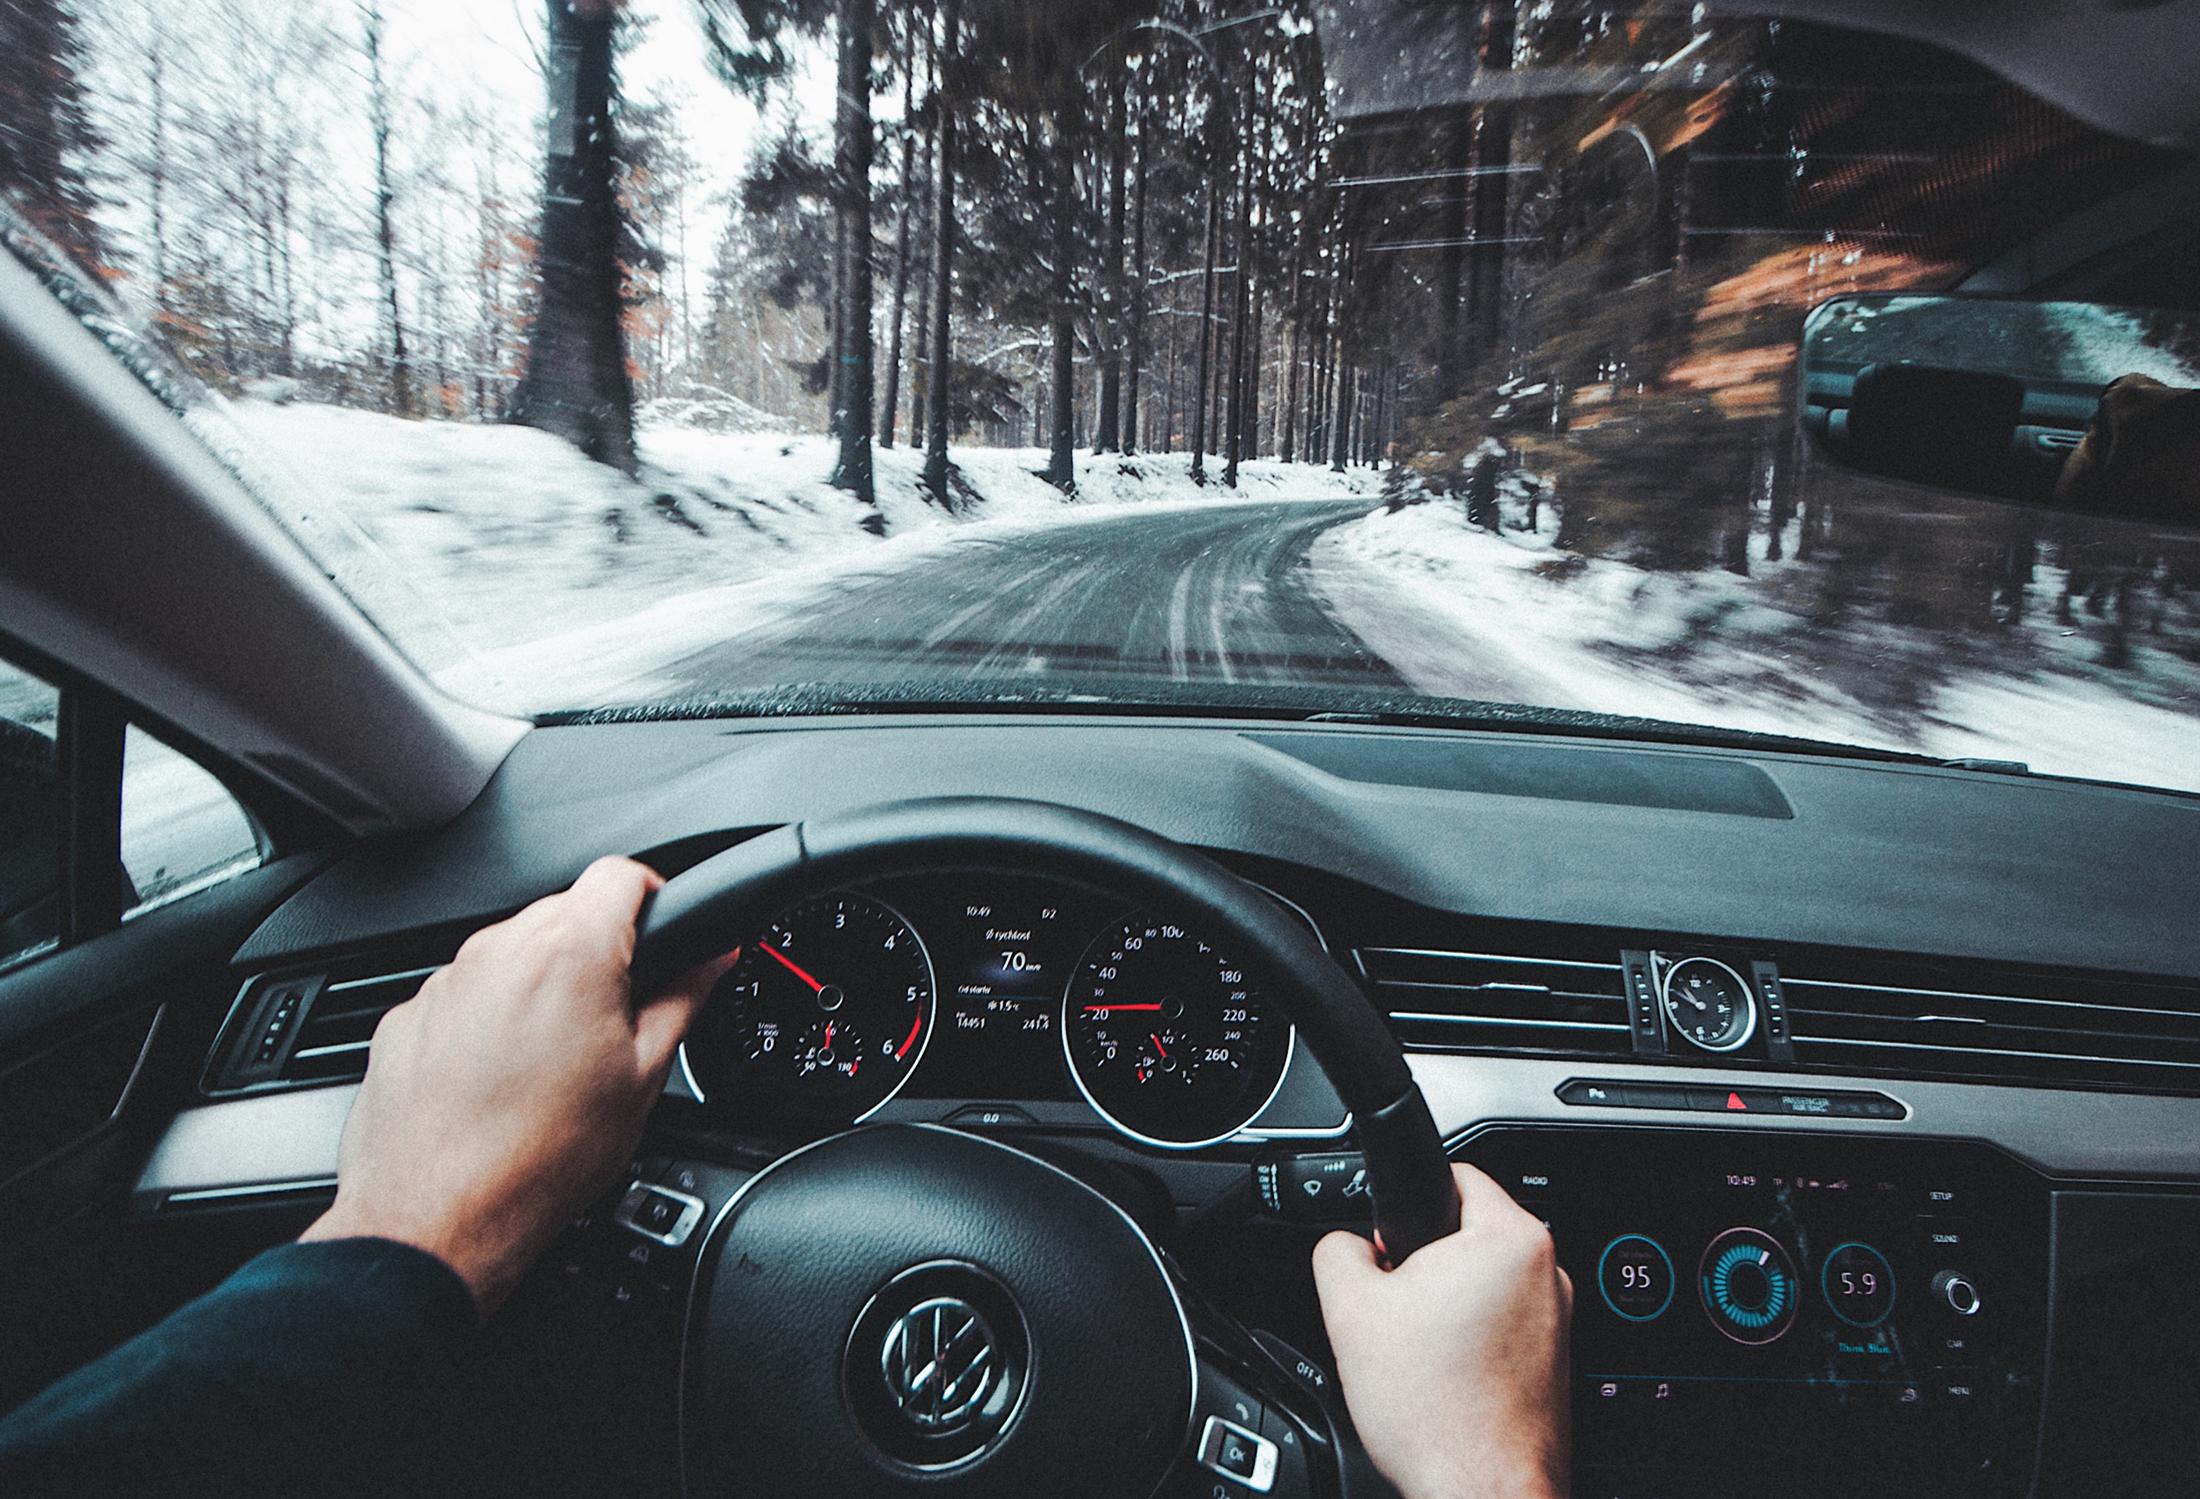 BrokerUnion Driving Insurance